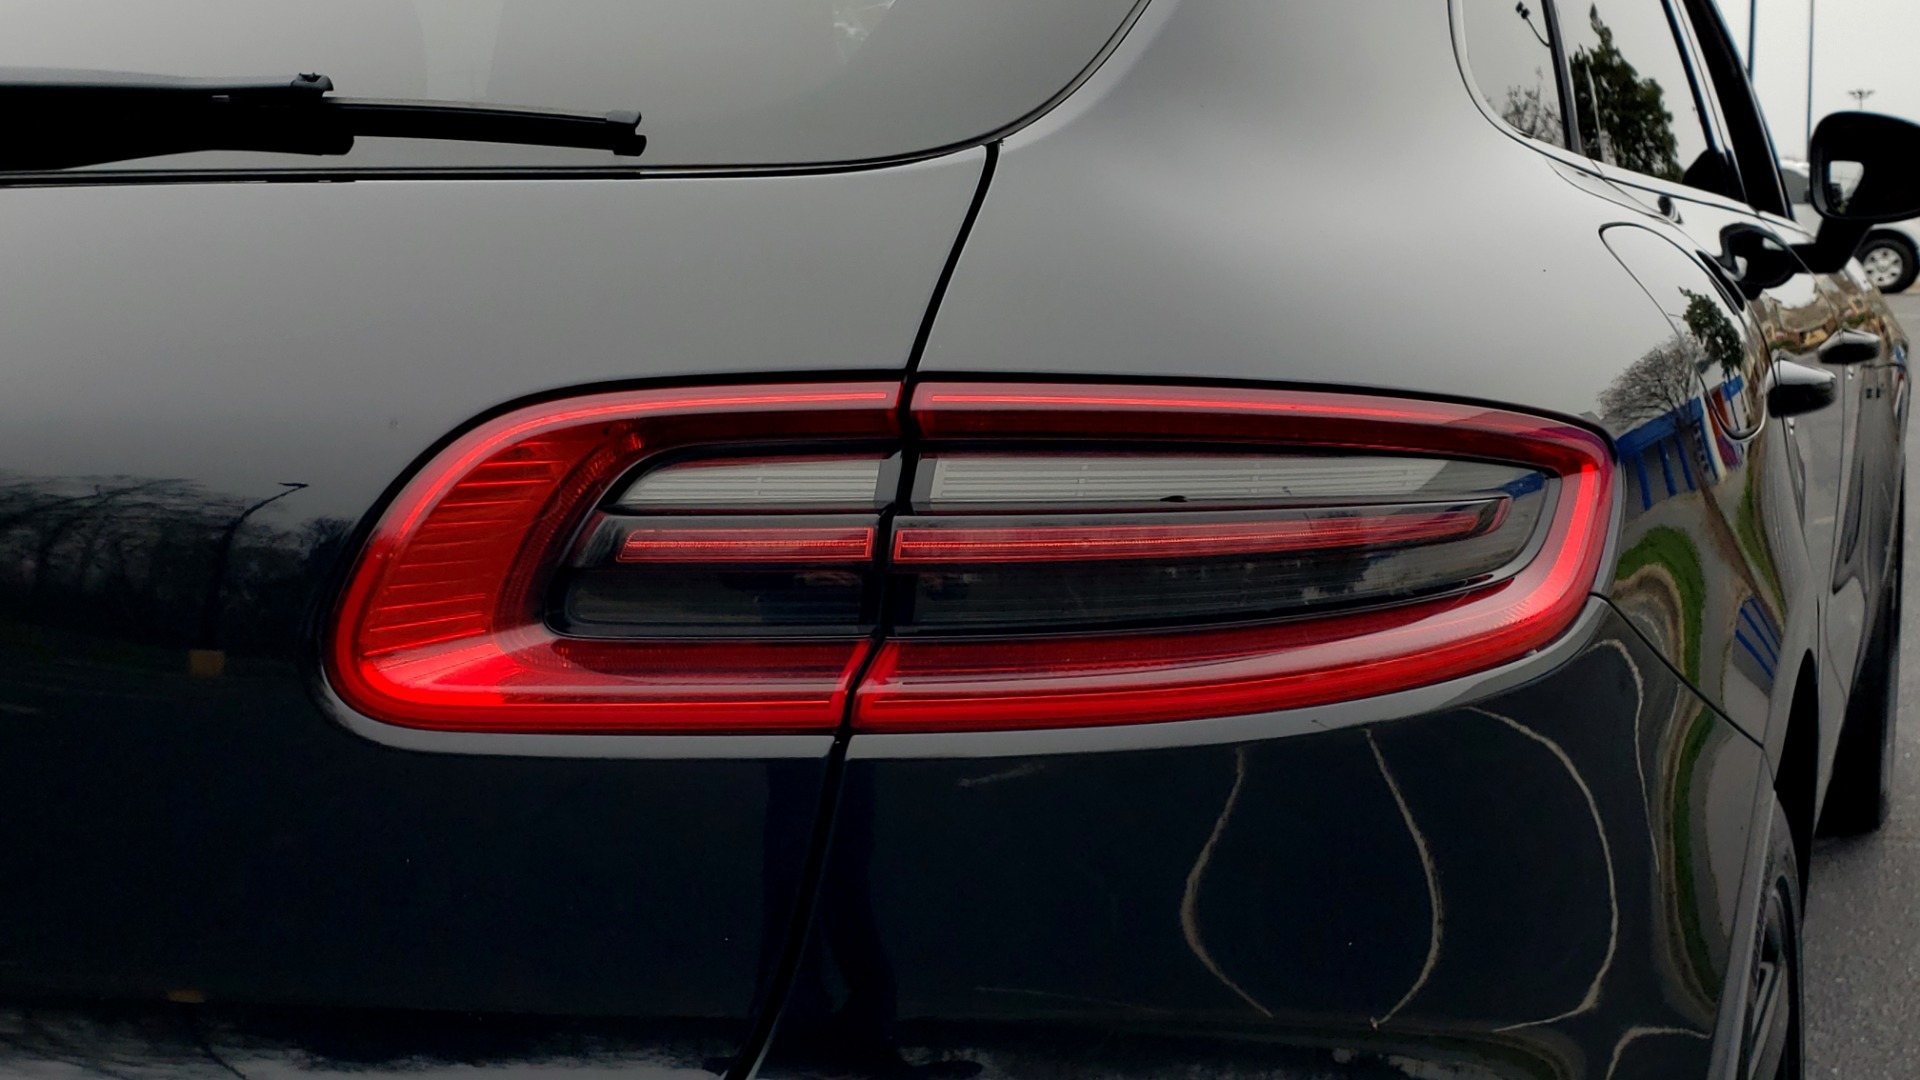 Used 2016 Porsche MACAN TURBO / PREM / NAV / PARK ASST / BOSE / PDK / CHRONO PKG for sale Sold at Formula Imports in Charlotte NC 28227 27